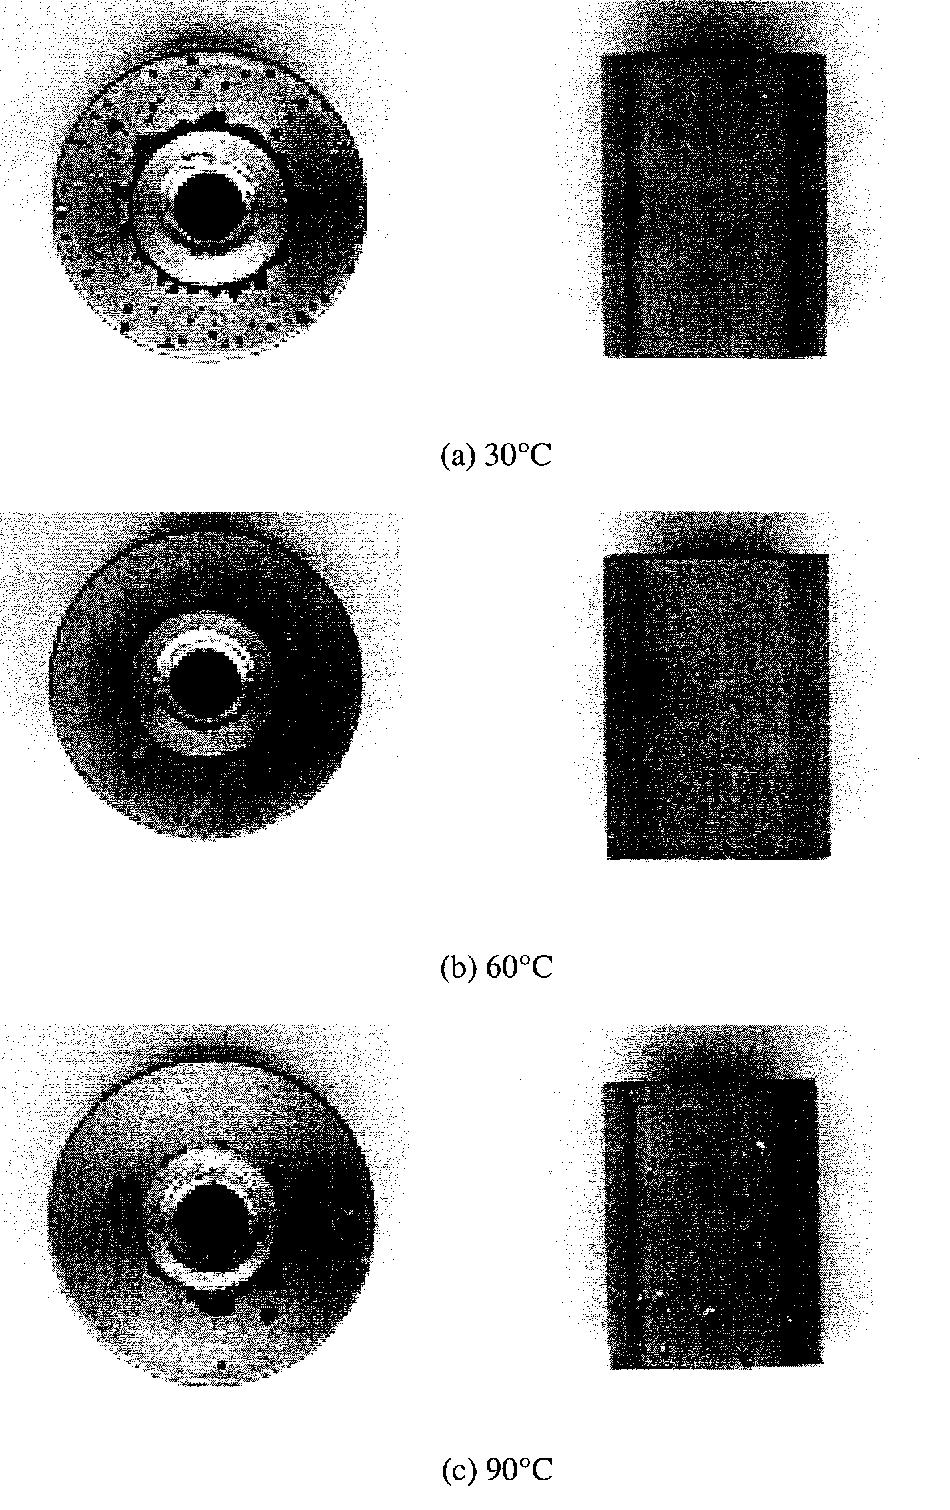 Figure 4.39 Appearances of Polarized Specimens in Acidic Solution